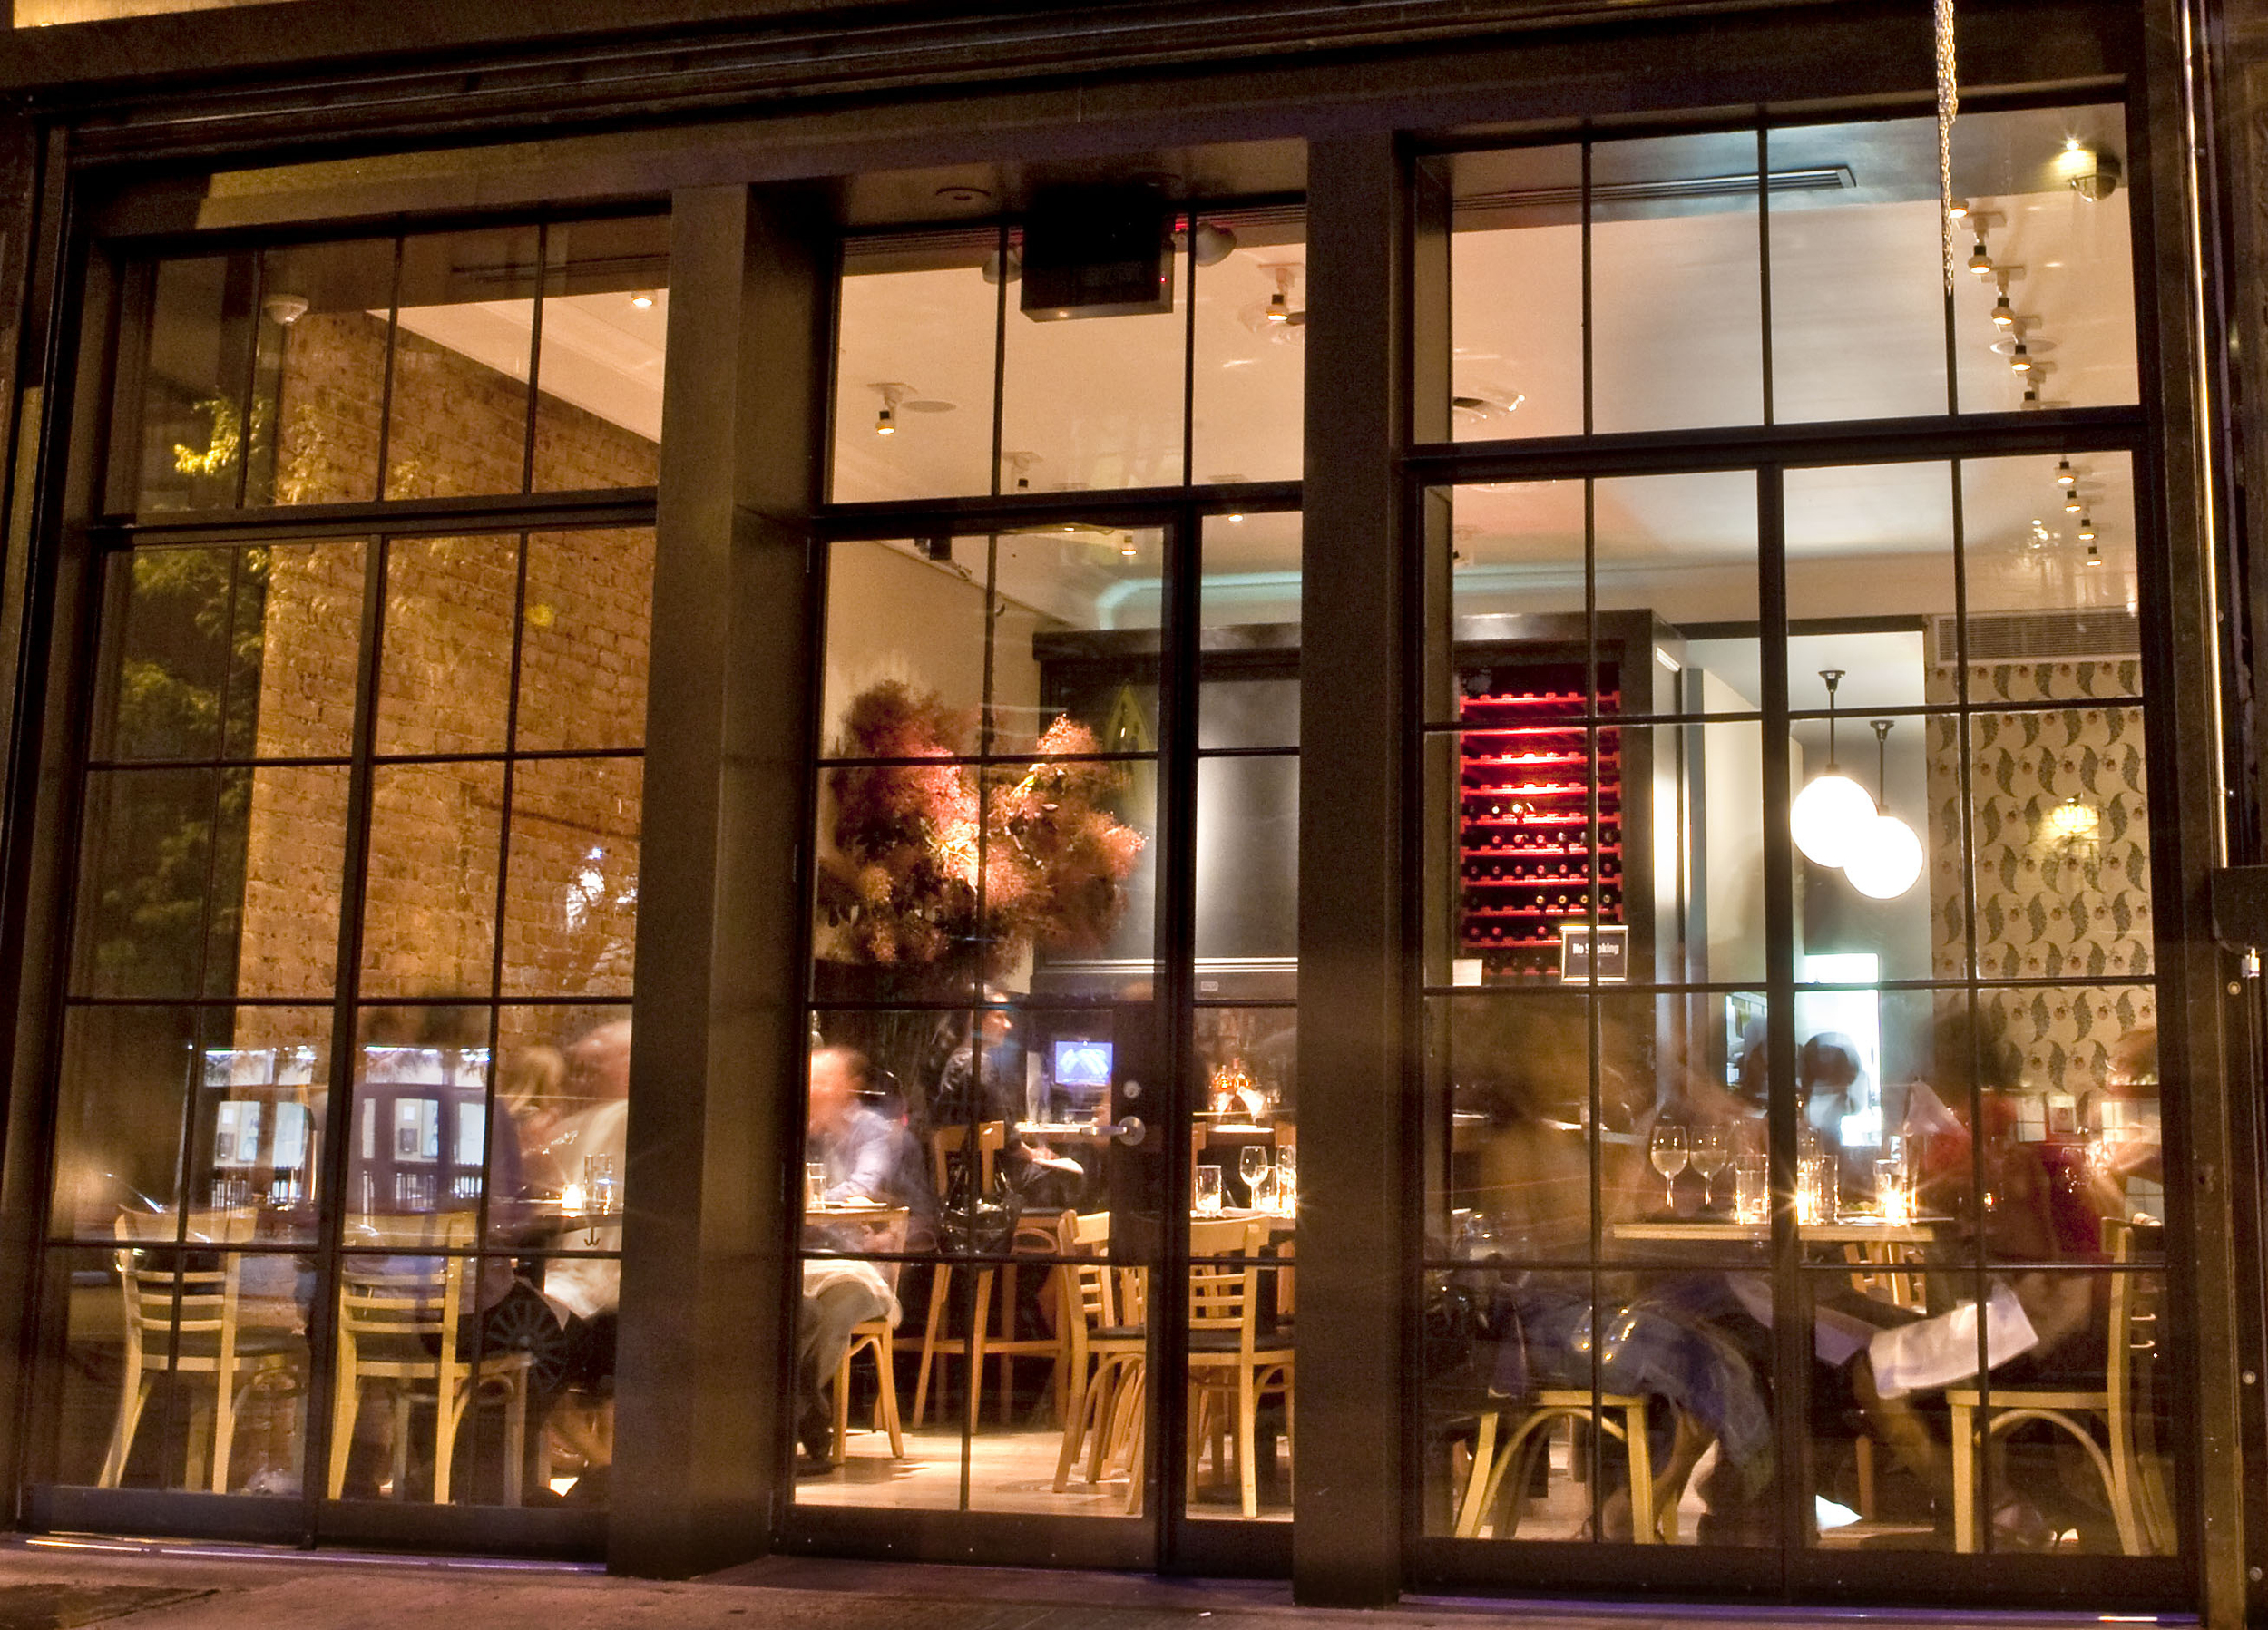 Storefront Elevation from Street (Restaurant renovation)